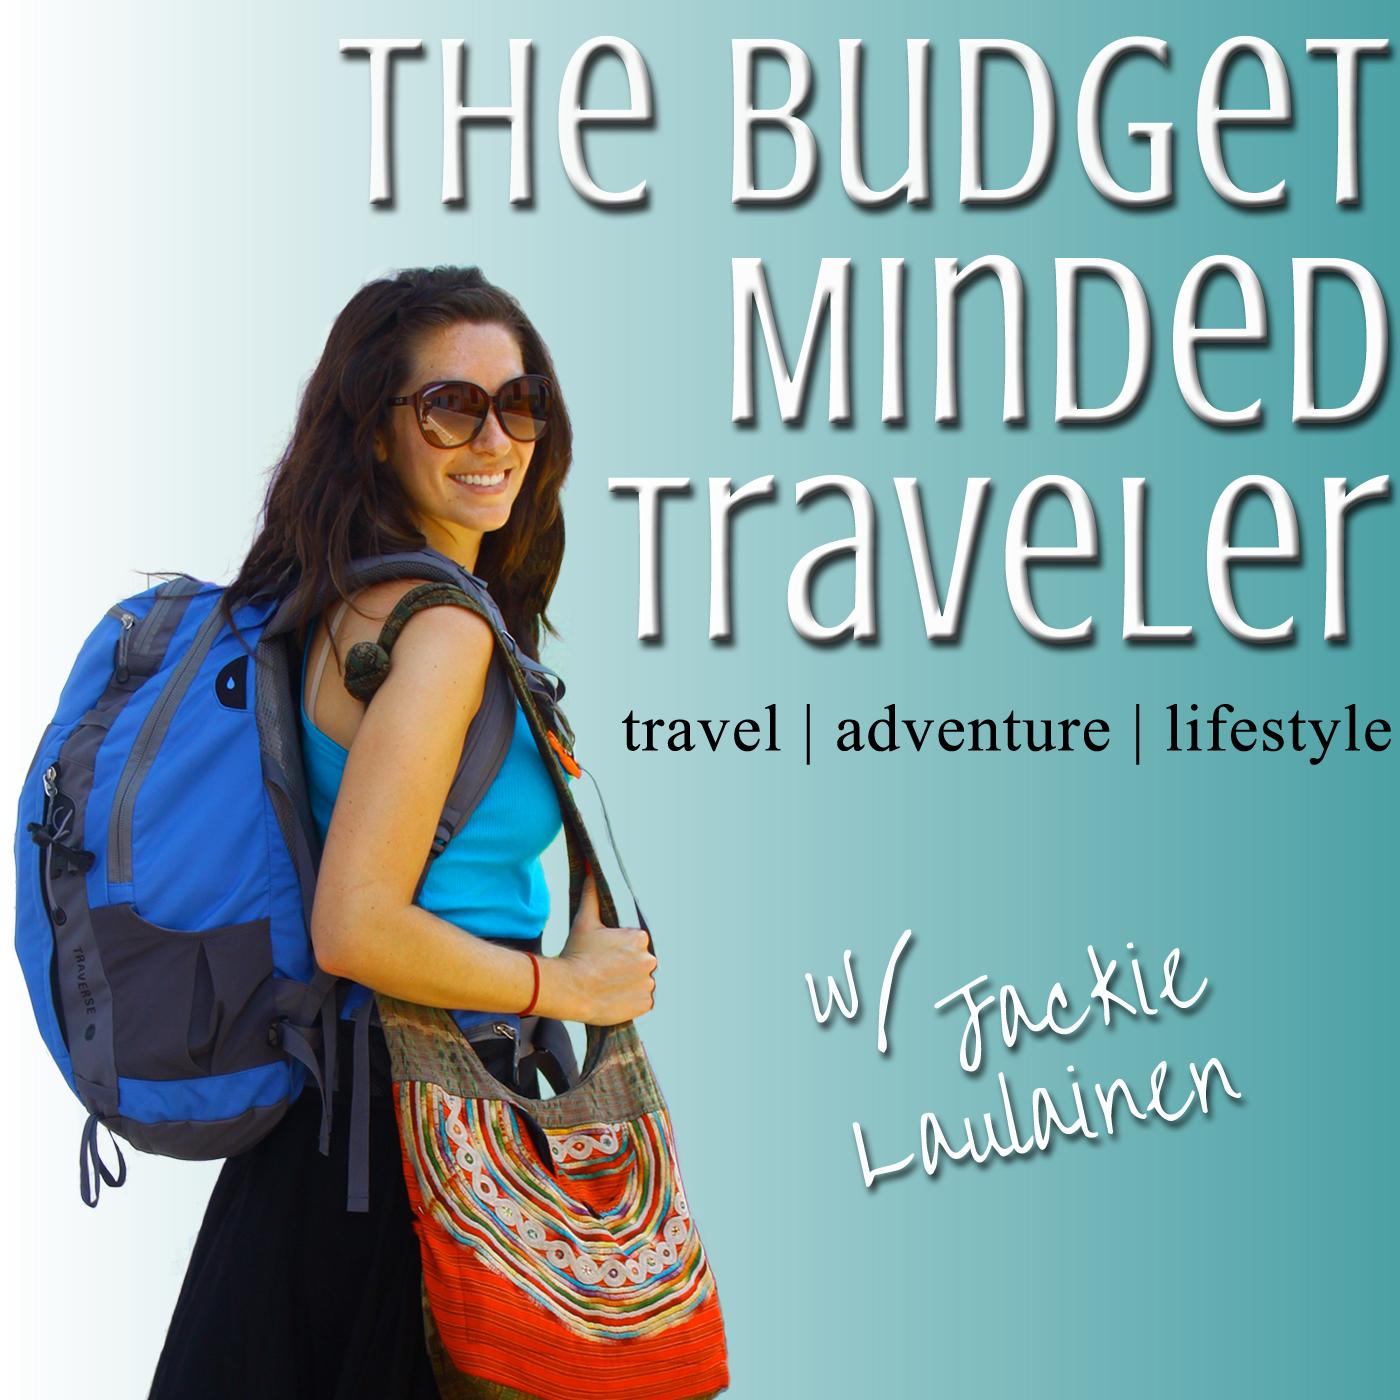 Jackie Laulainen's budget-travel podcast